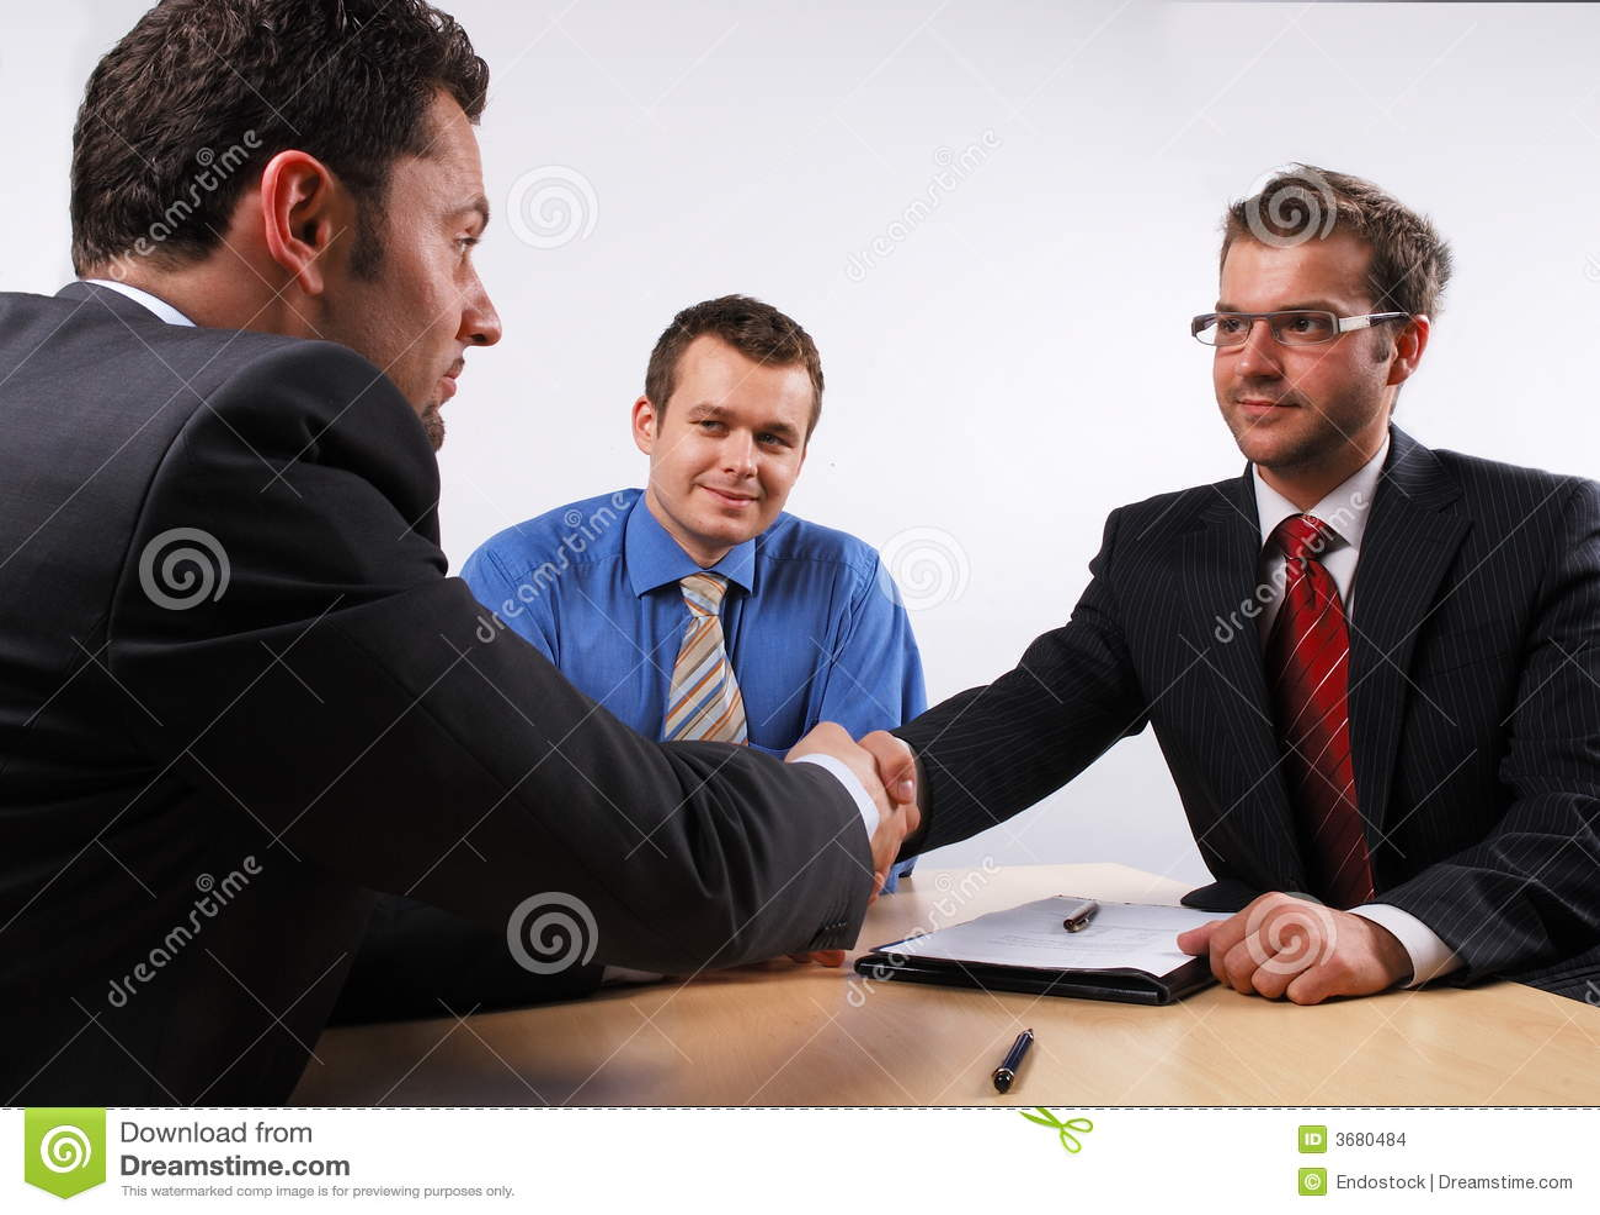 Handshake over signed cotract